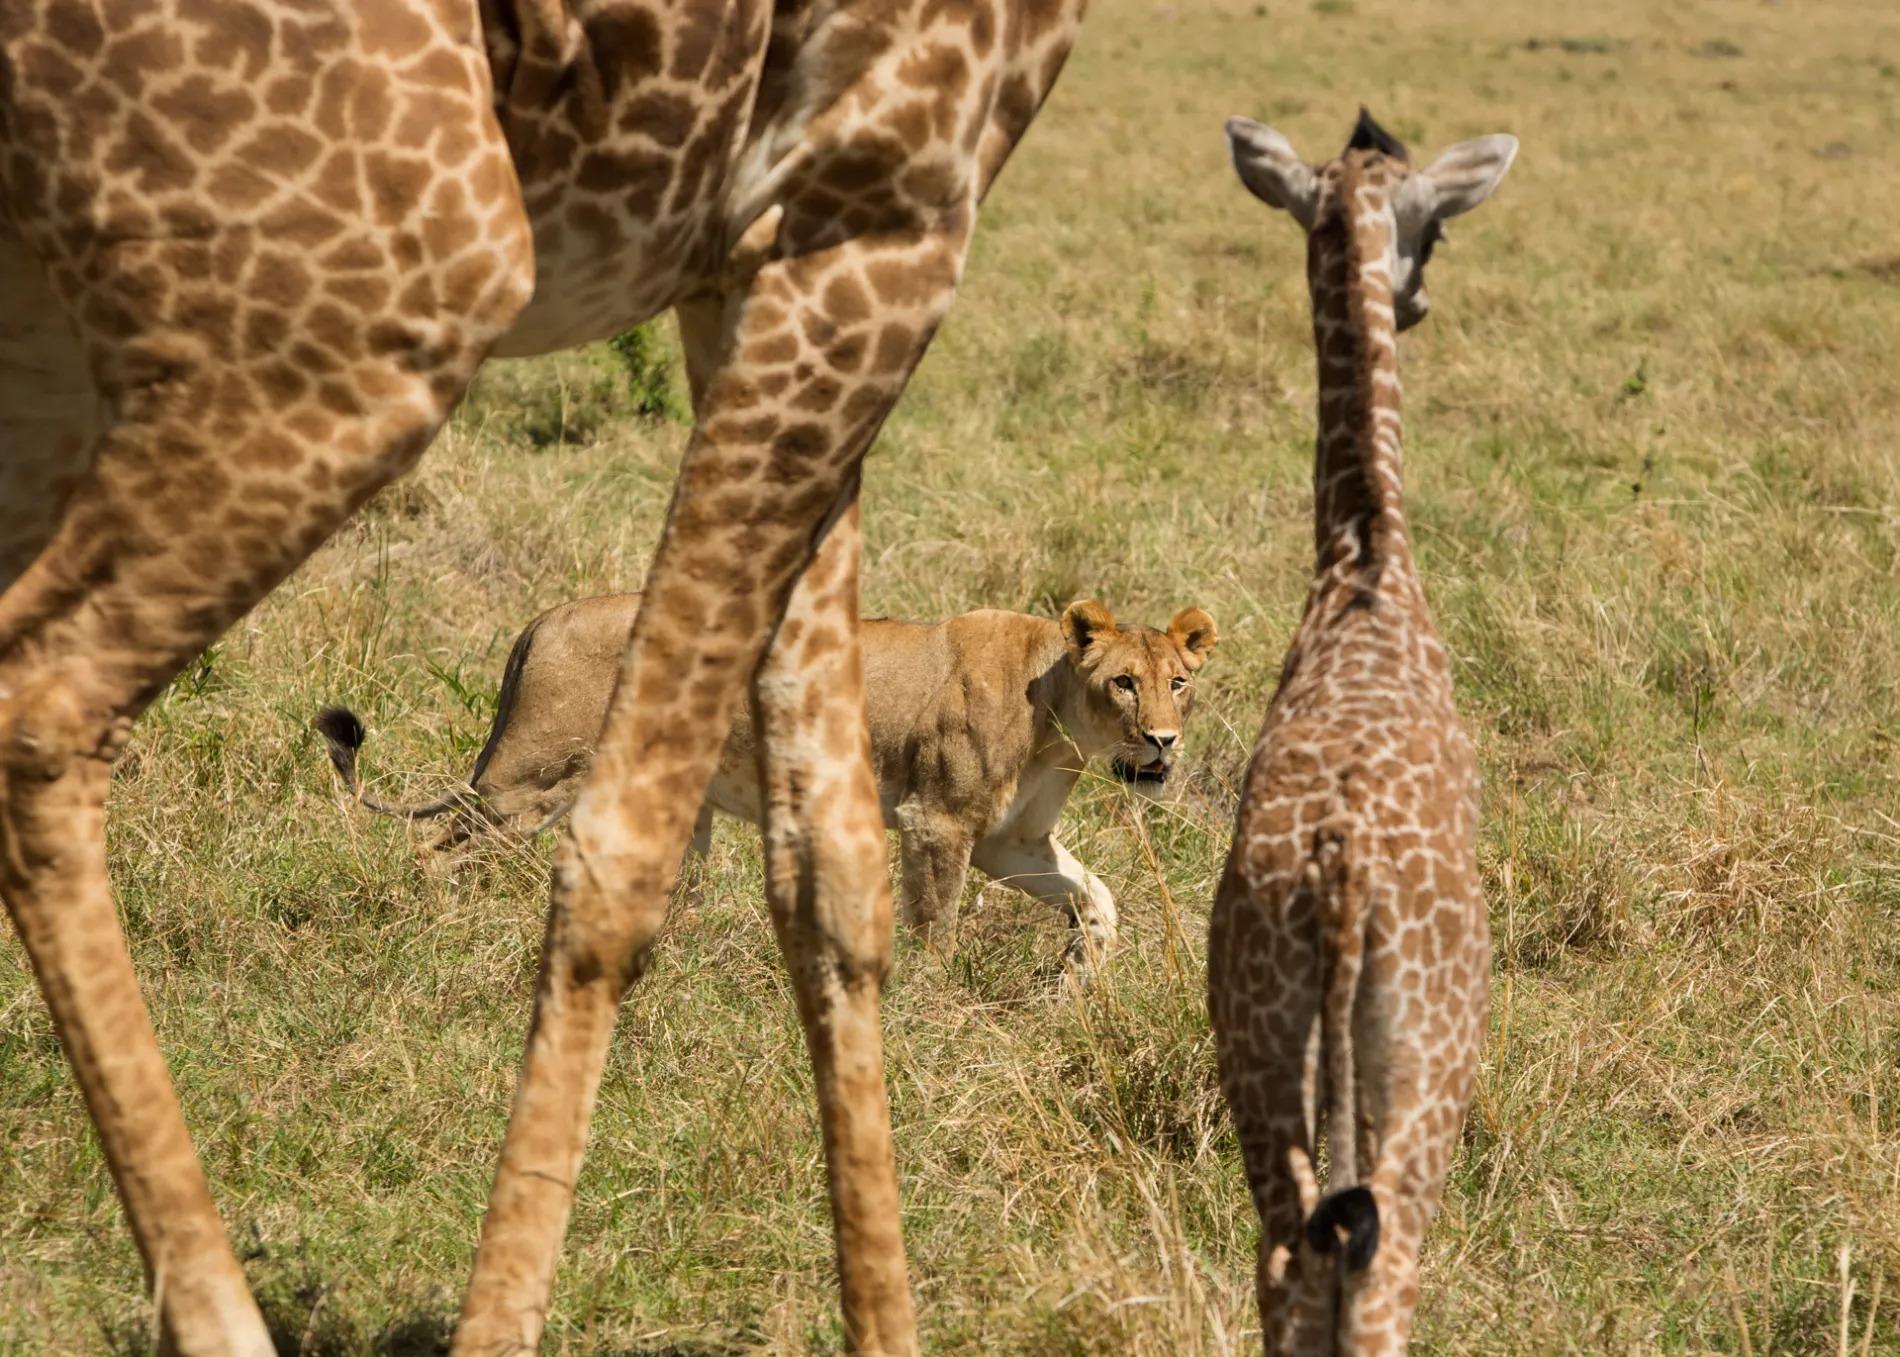 baby giraffe being stalked